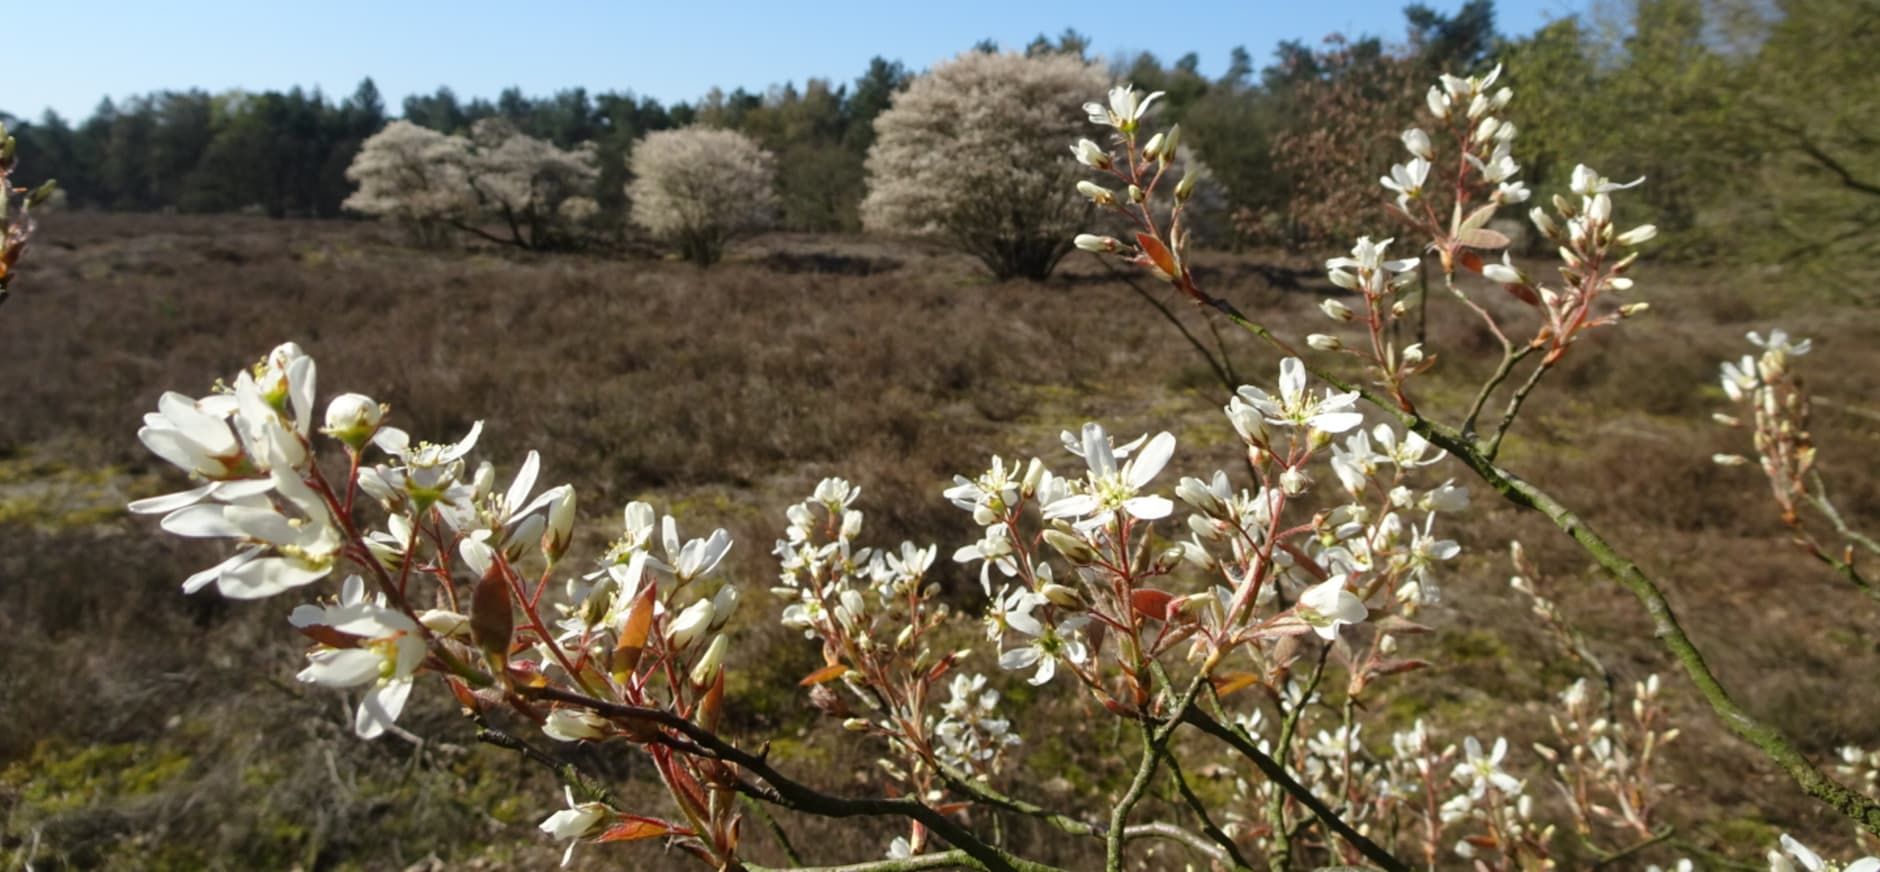 Bloeiende krentenbomen de Kraanvense heide in de de Loonse en Drunense Duinen.